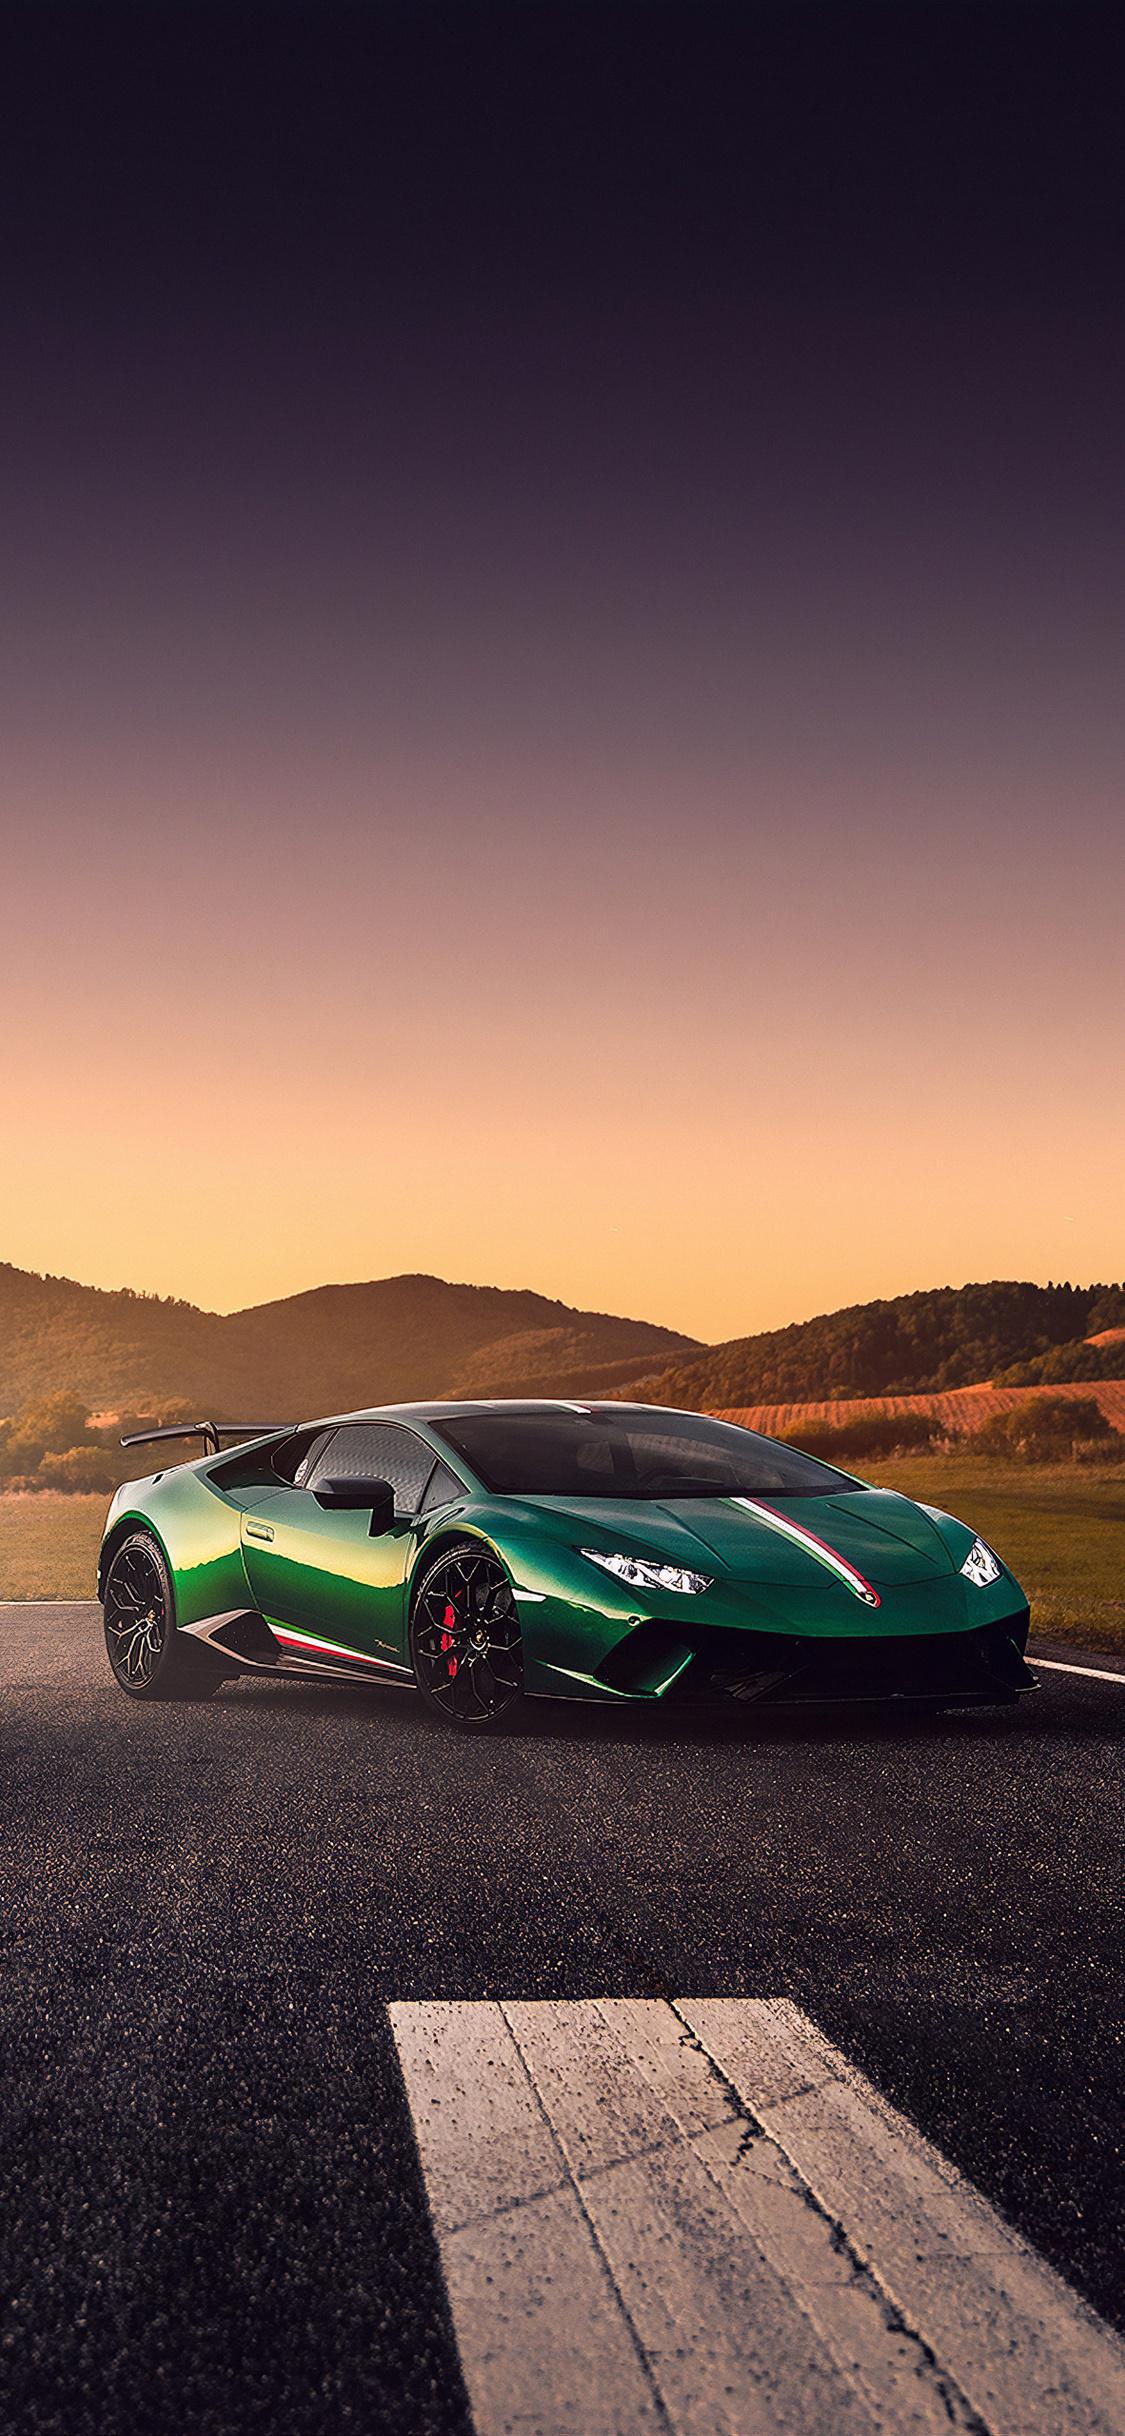 1125x2436 Ferrrari And Lamborghini Huracan 4k Iphone XS ...